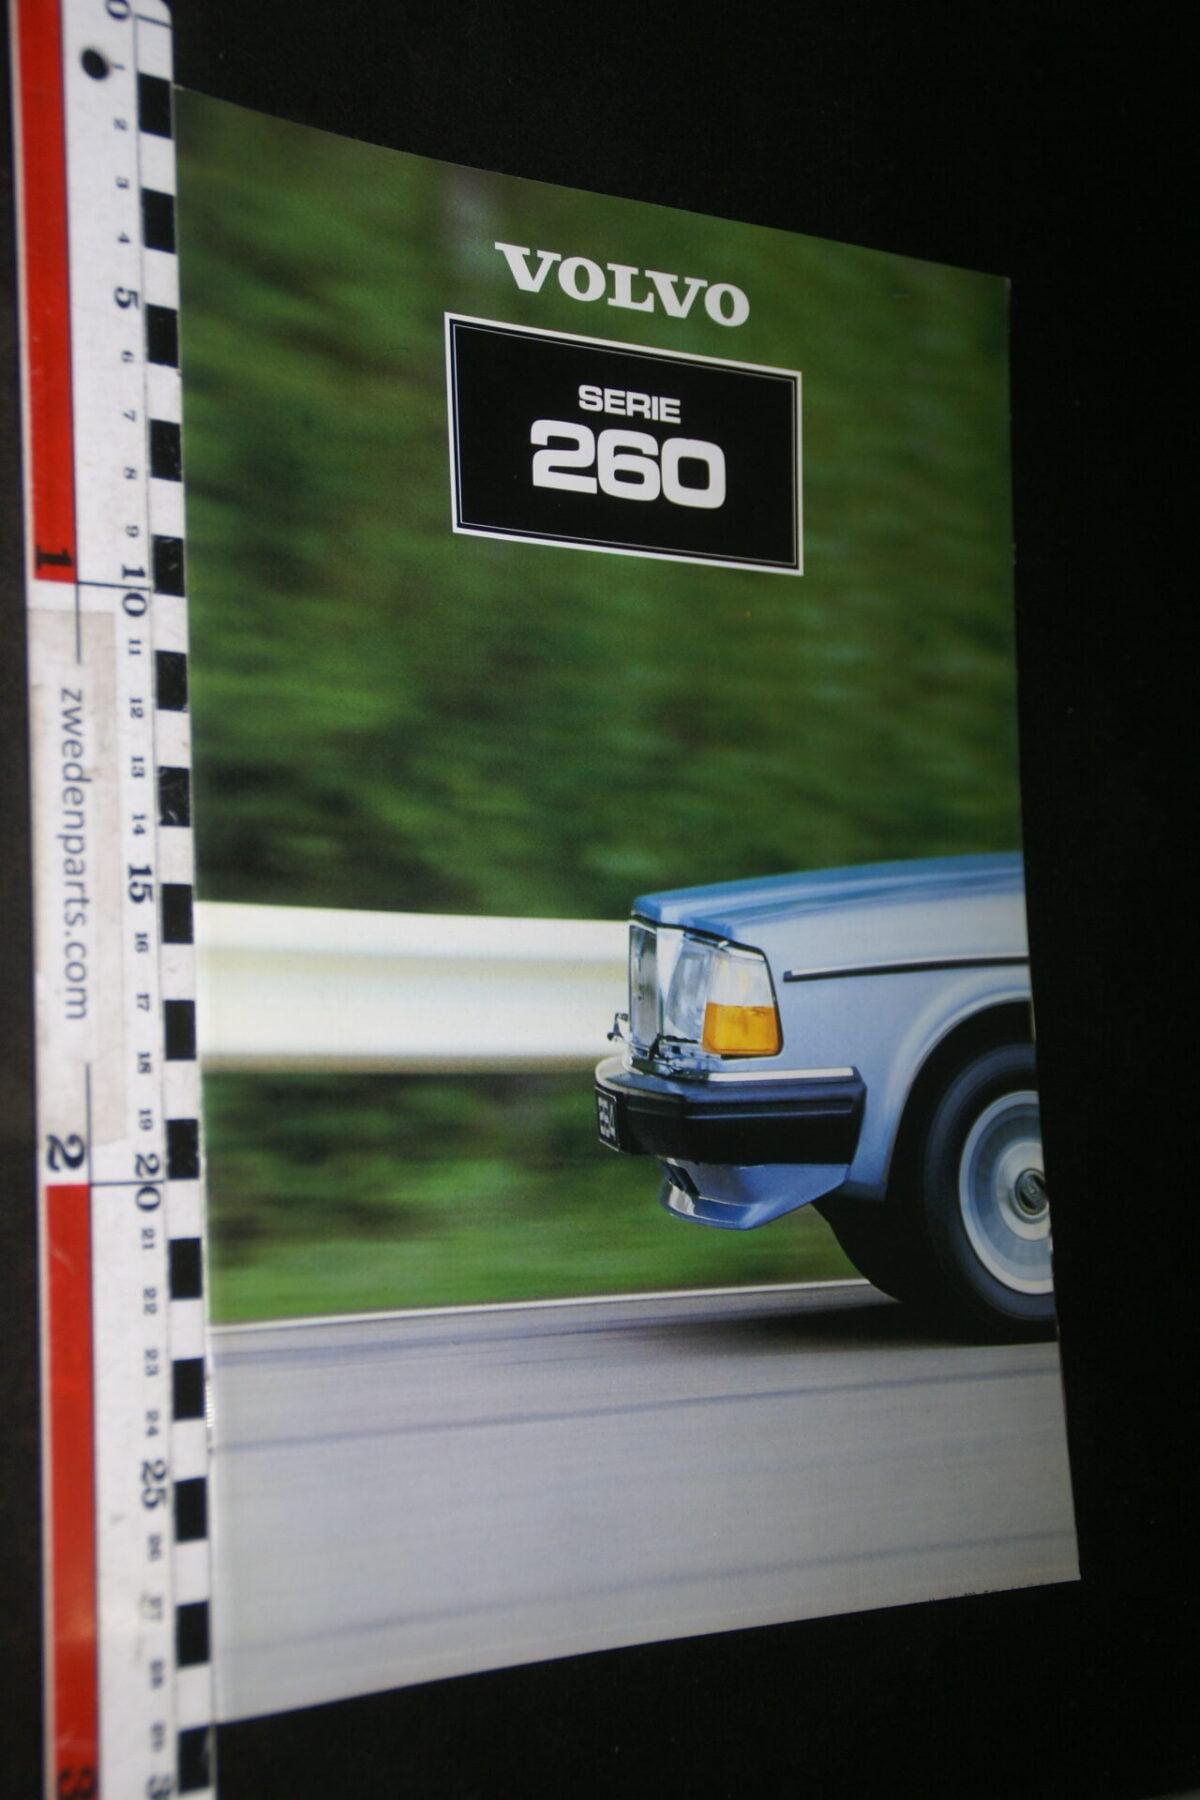 DSC06767 1981 originele brochure Volvo serie 260  met 262C nr. ASPPV 8563-07f3aa09